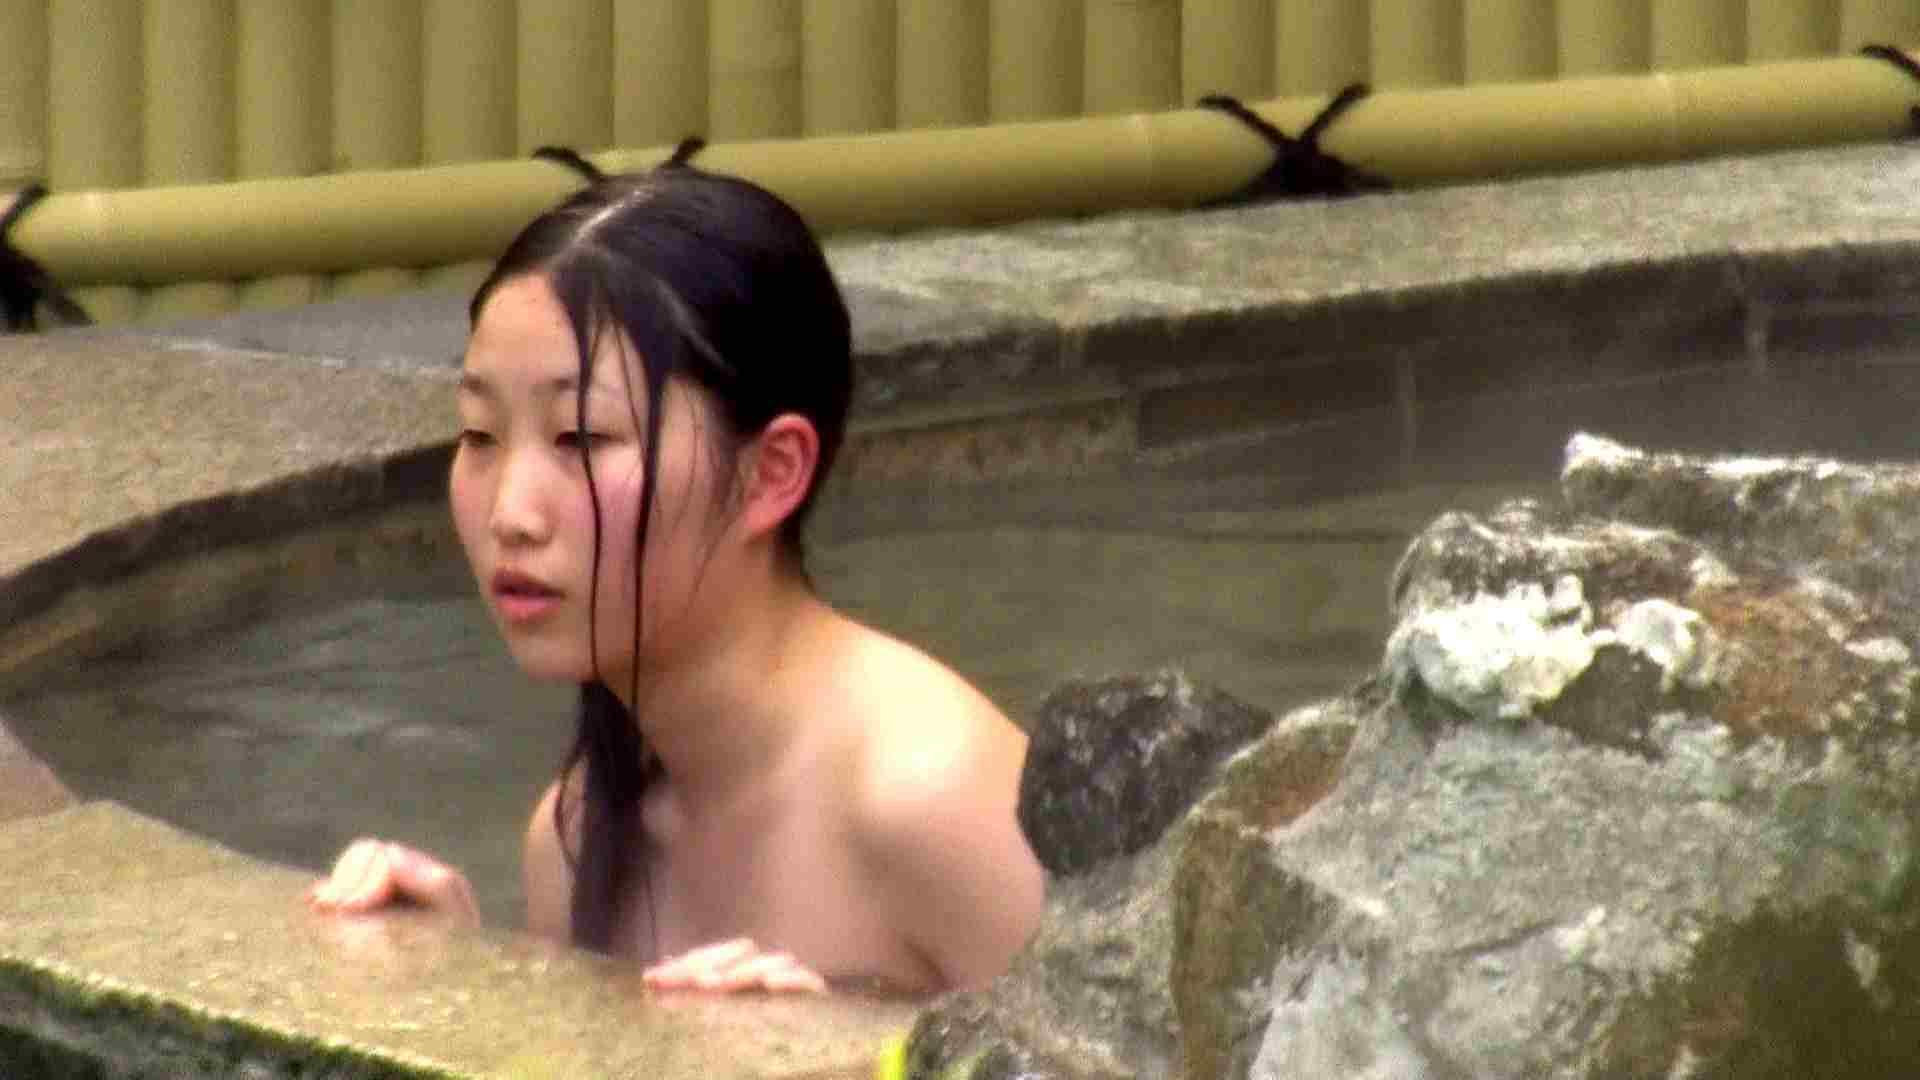 Aquaな露天風呂Vol.218 OLエロ画像 盗撮オマンコ無修正動画無料 81PICs 29